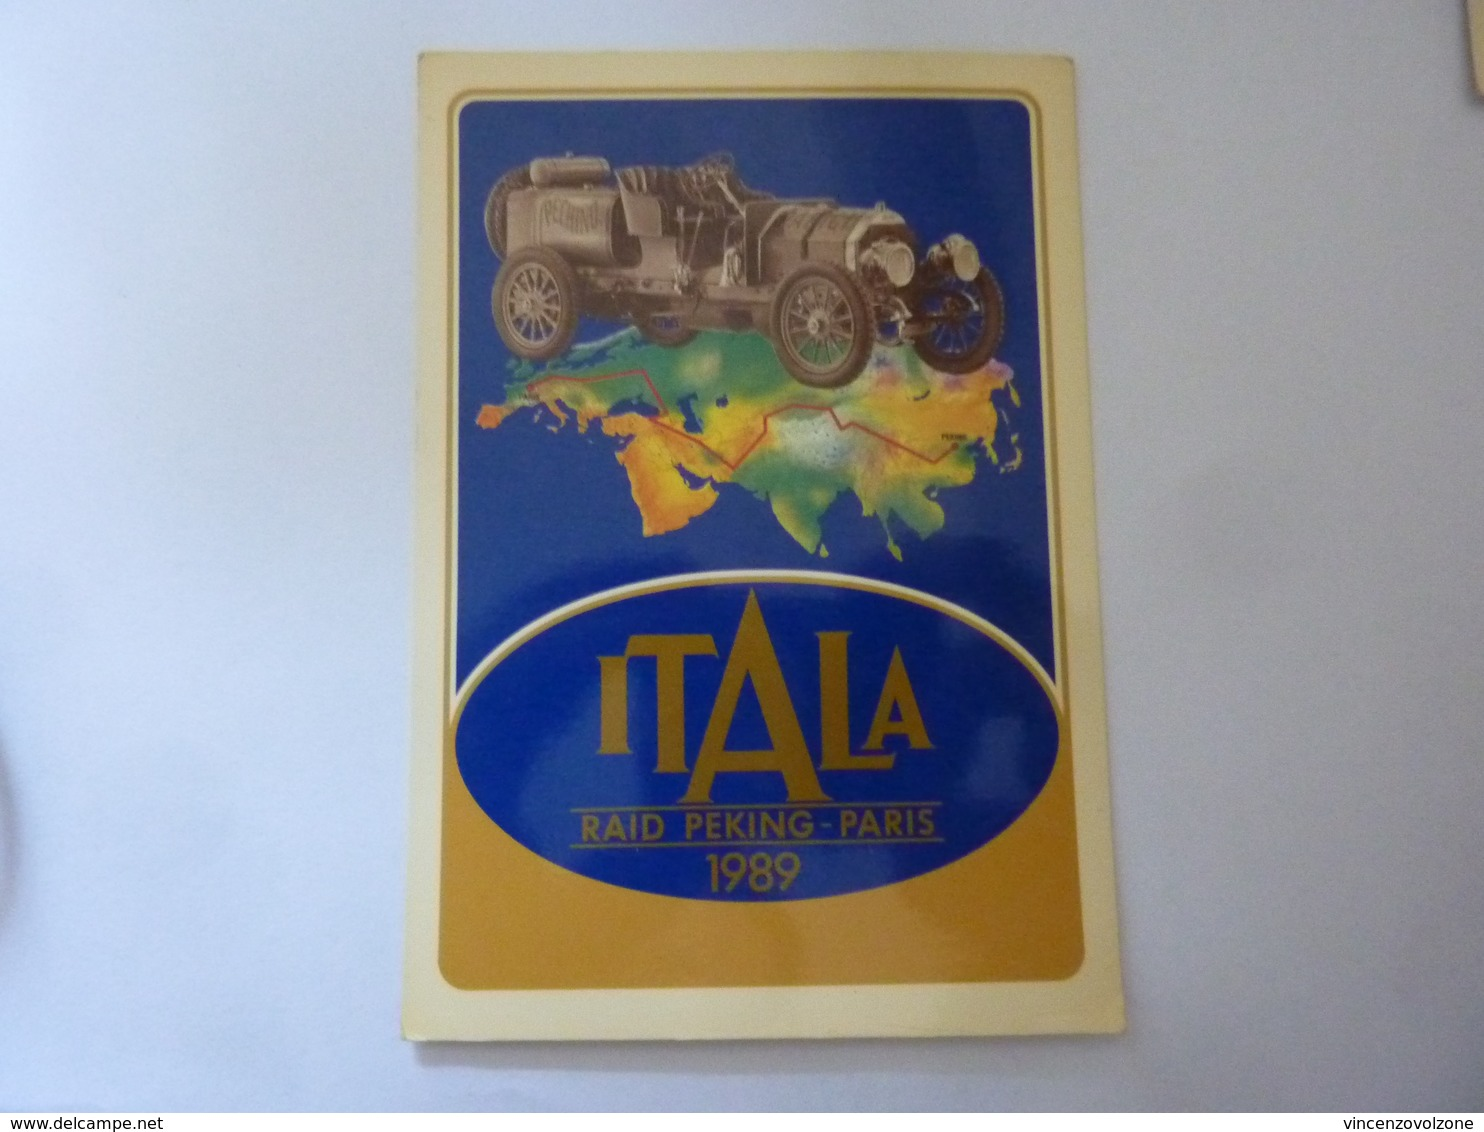 "Cartolina  Viaggiata ""ITALA RAID PEKING PARIS 1989 Saluti Dal BELGIO"" Autografi Partecipanti - Altri"